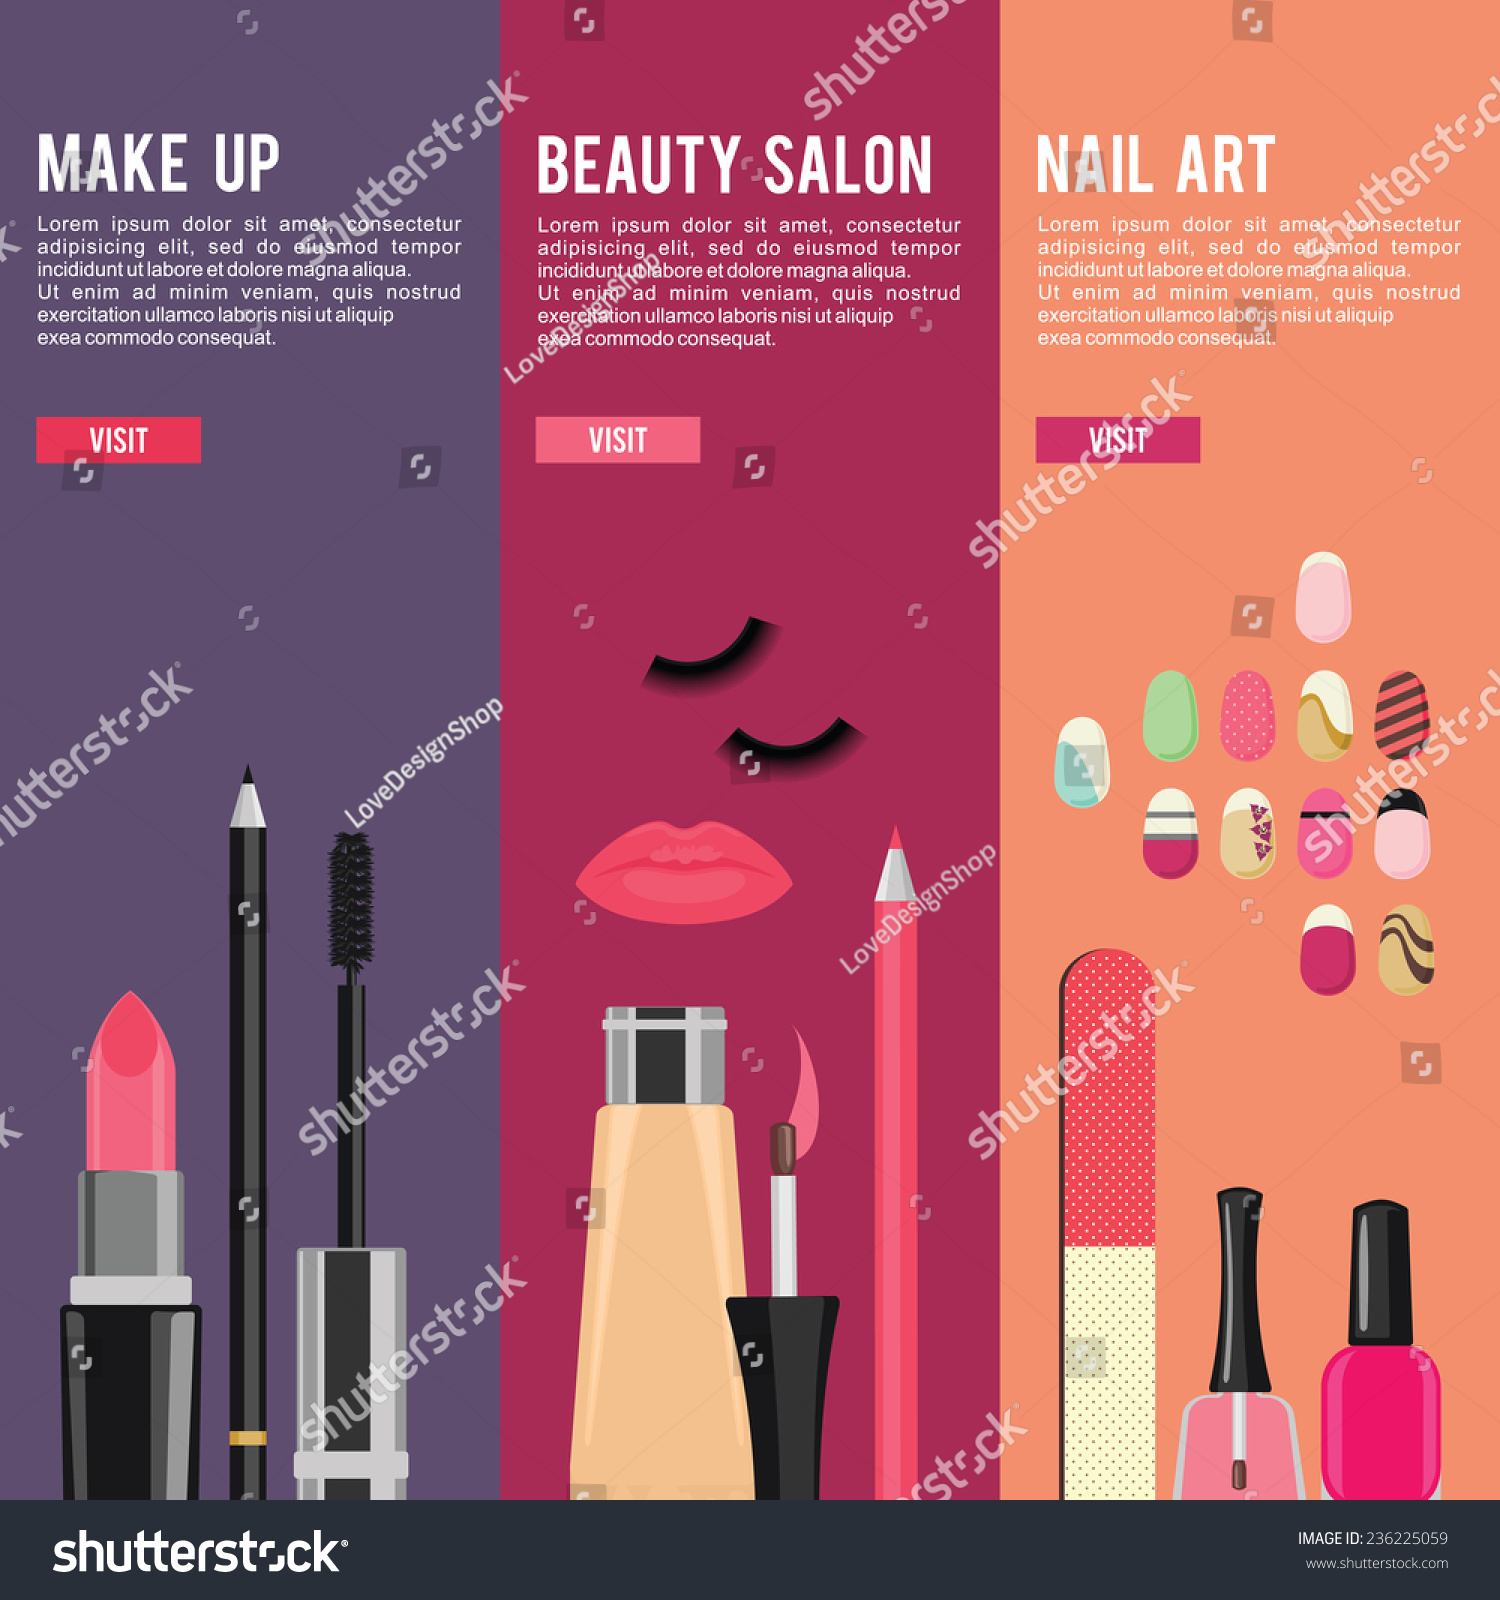 Nails Art Beauty Salon Background Stock Vector: Beauty And Manicure Nail Art Salon, Cosmetics And